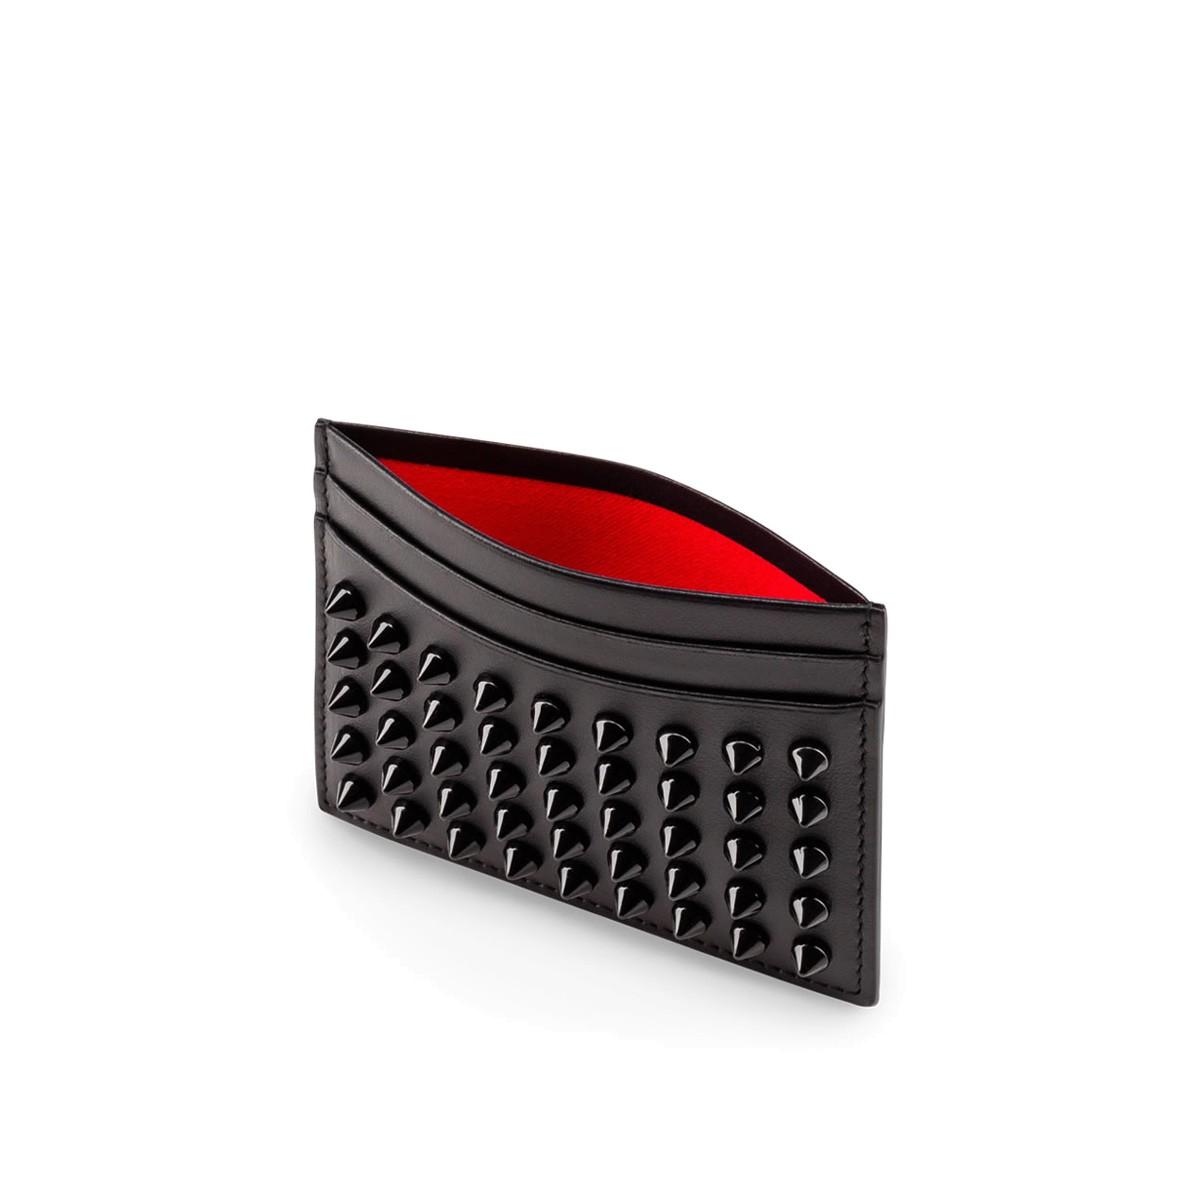 88666671e363 Christian Louboutin Kios Simple Card Holder